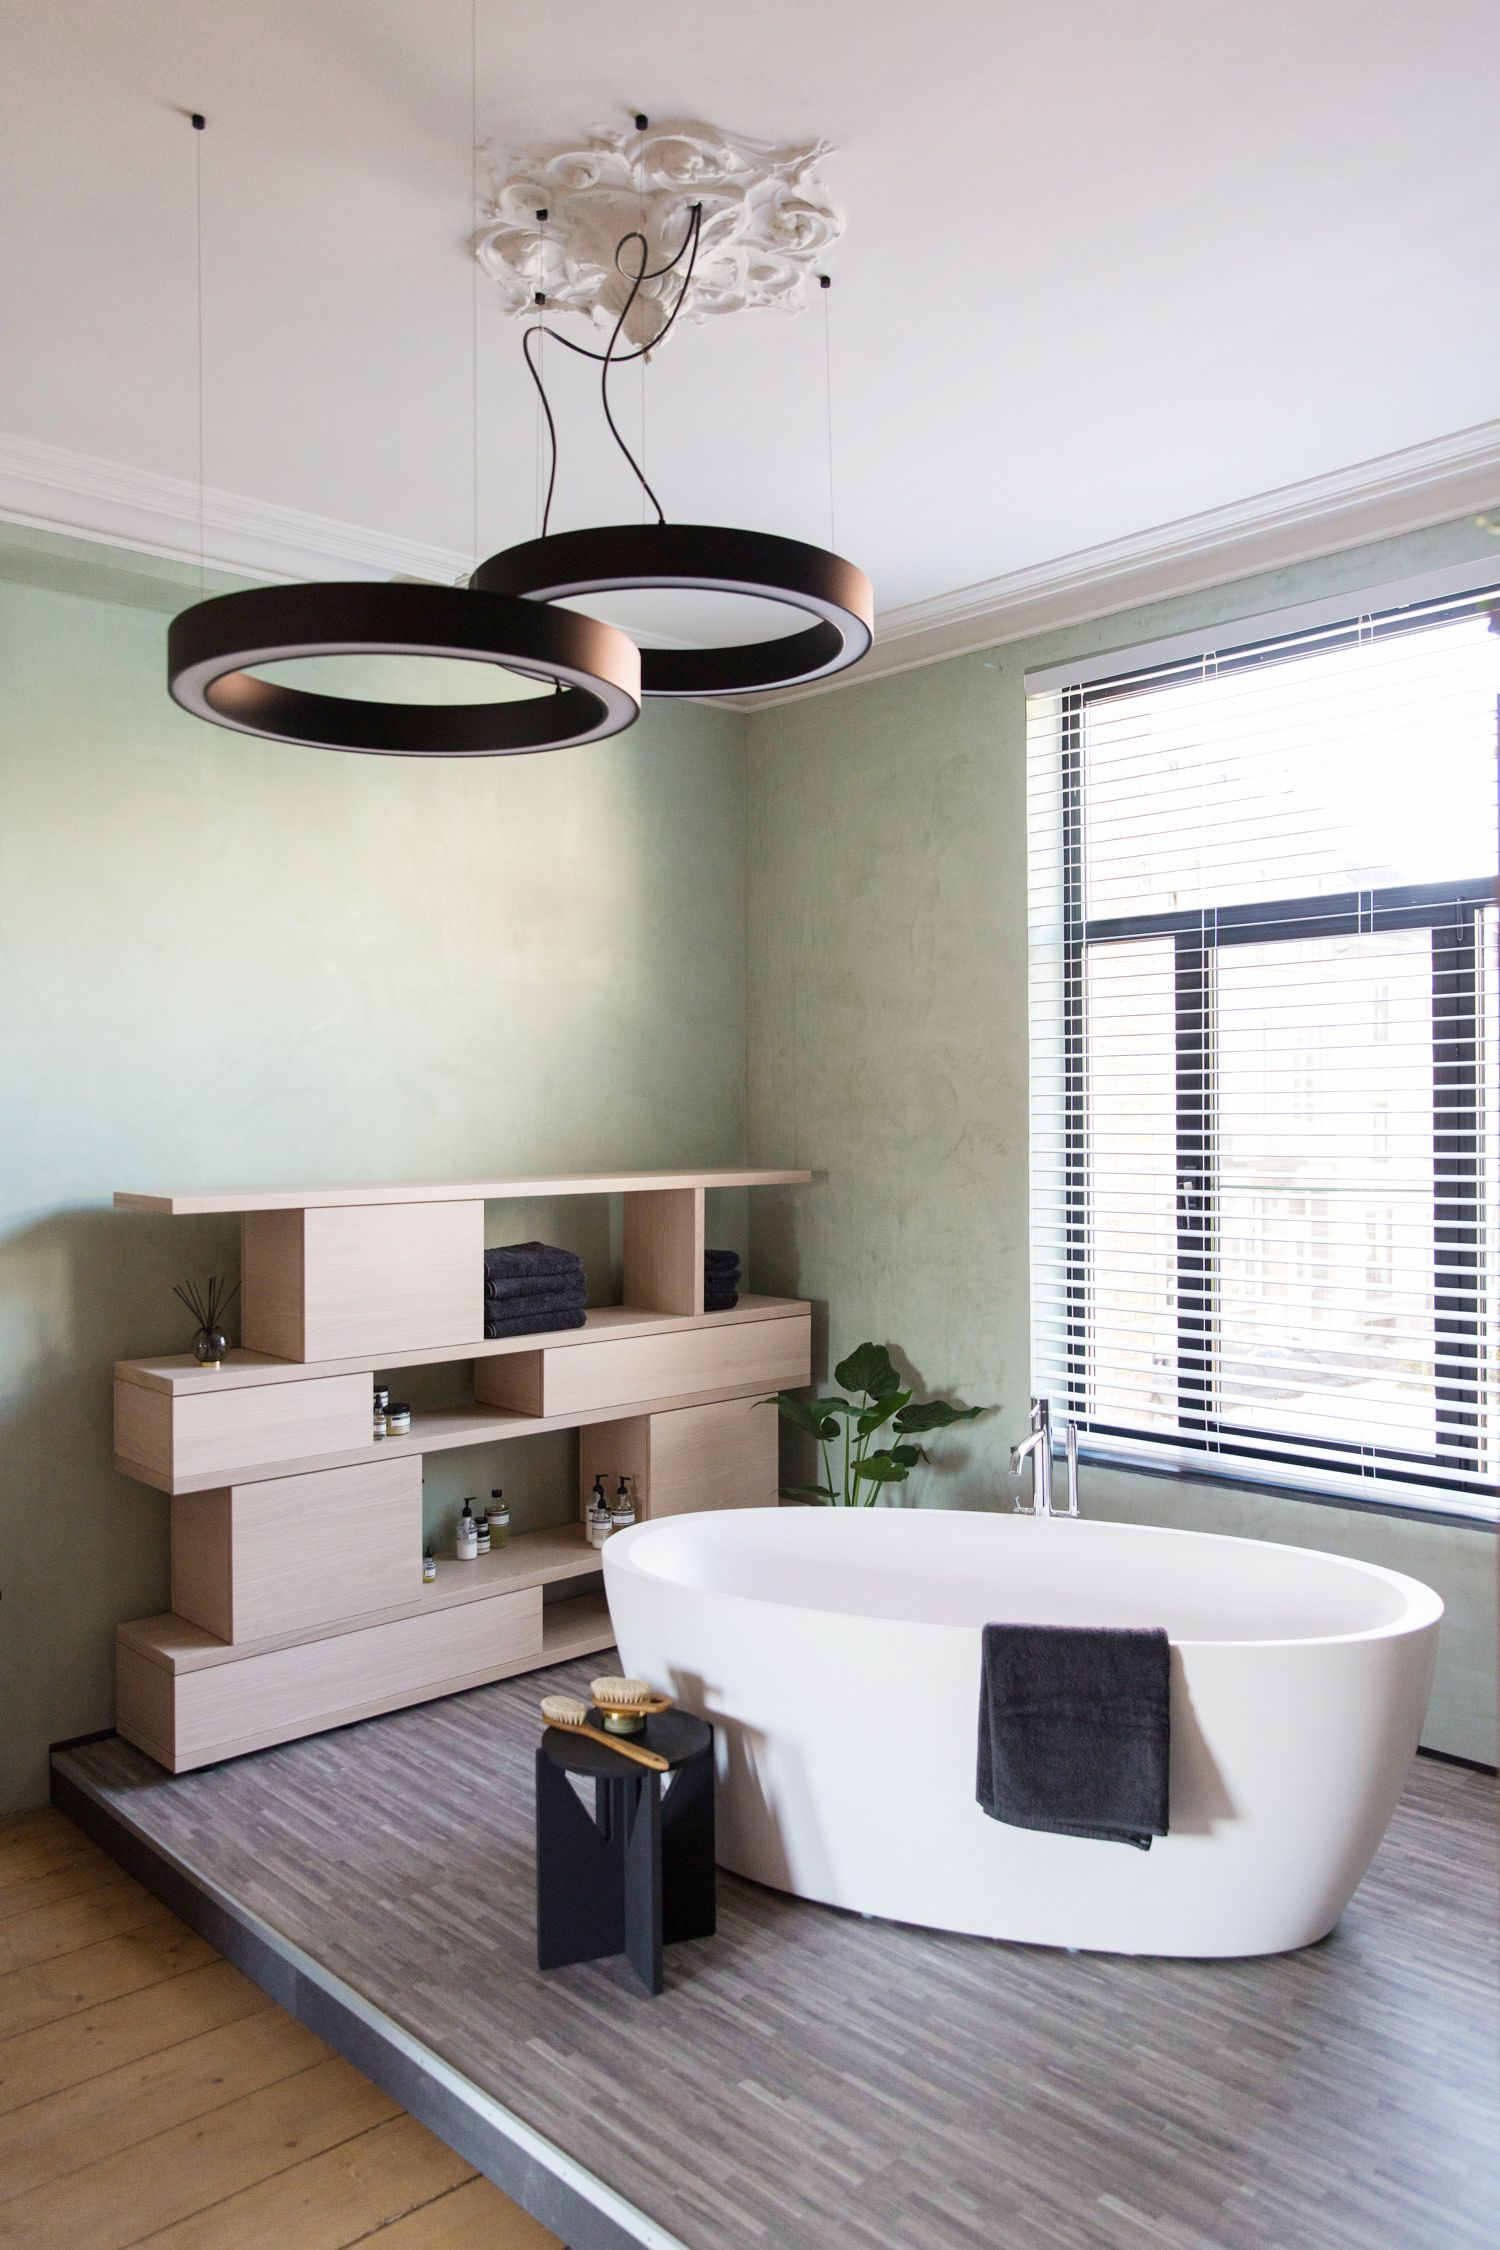 Walls · Bathroom Ft. BerryAlloc Riviera   Roma Laminate Flooring At  #RoominGent. #bath